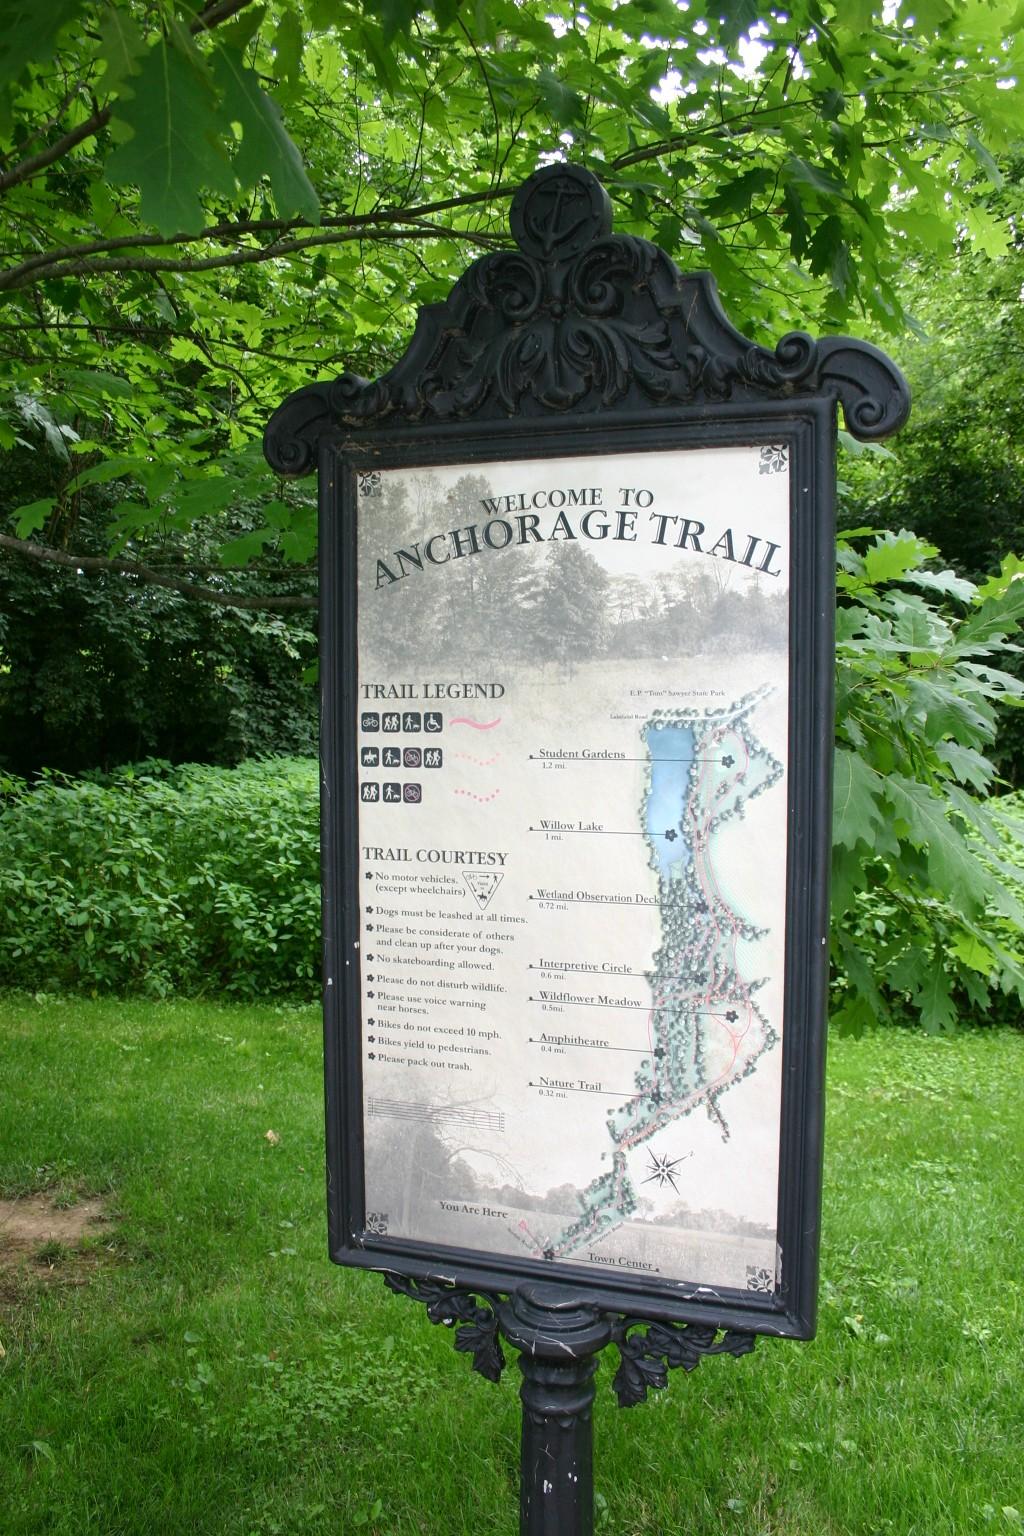 Anchorage Trail